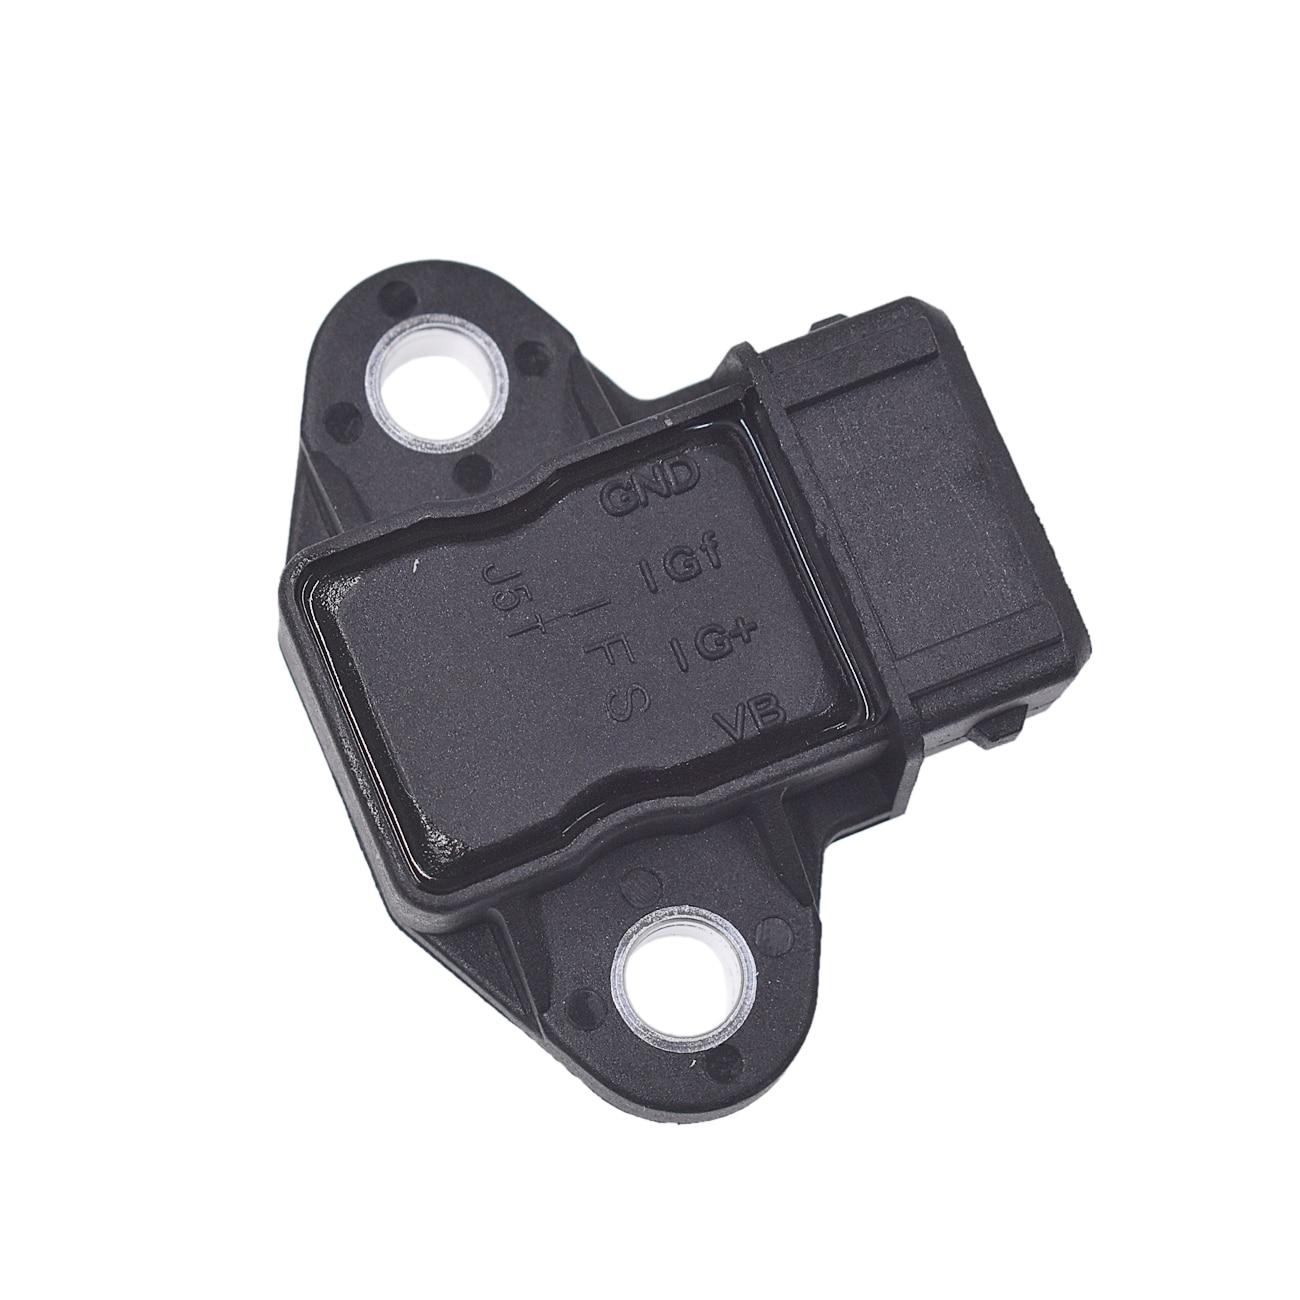 Ignition Misfire Sensor Control Module Igniter For Mitsubishi MD374437 J5T 60572